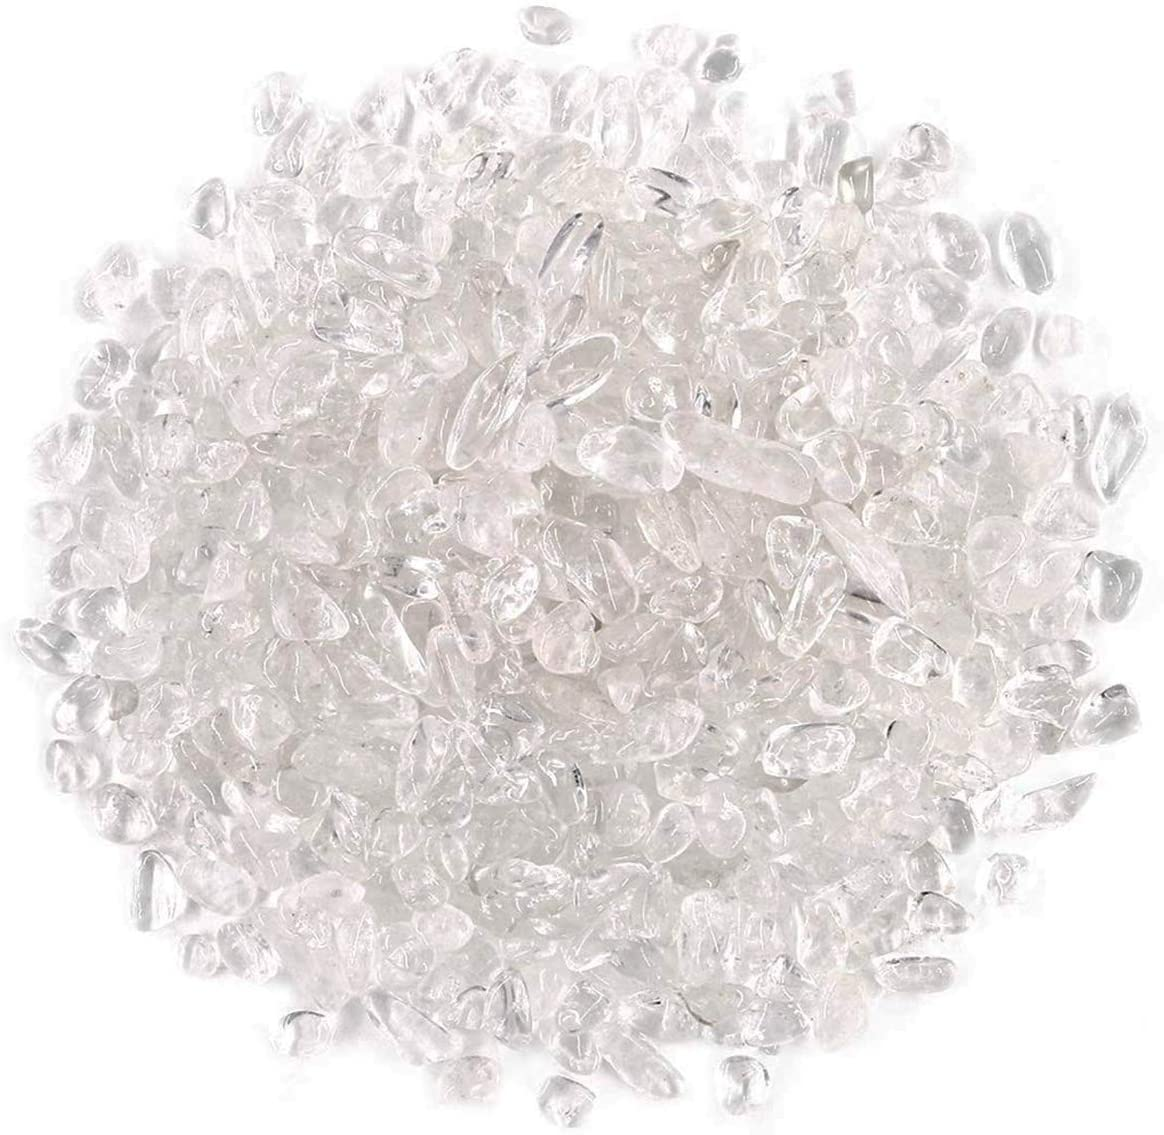 WAYBER 1 Lb/460g Irregular Decorative Pebbles Crystal Quartz Stones Rock Sand for Aquarium/Fish Turtle Tank/Vase Fillers/Air Plants/Succulent Plants Decor